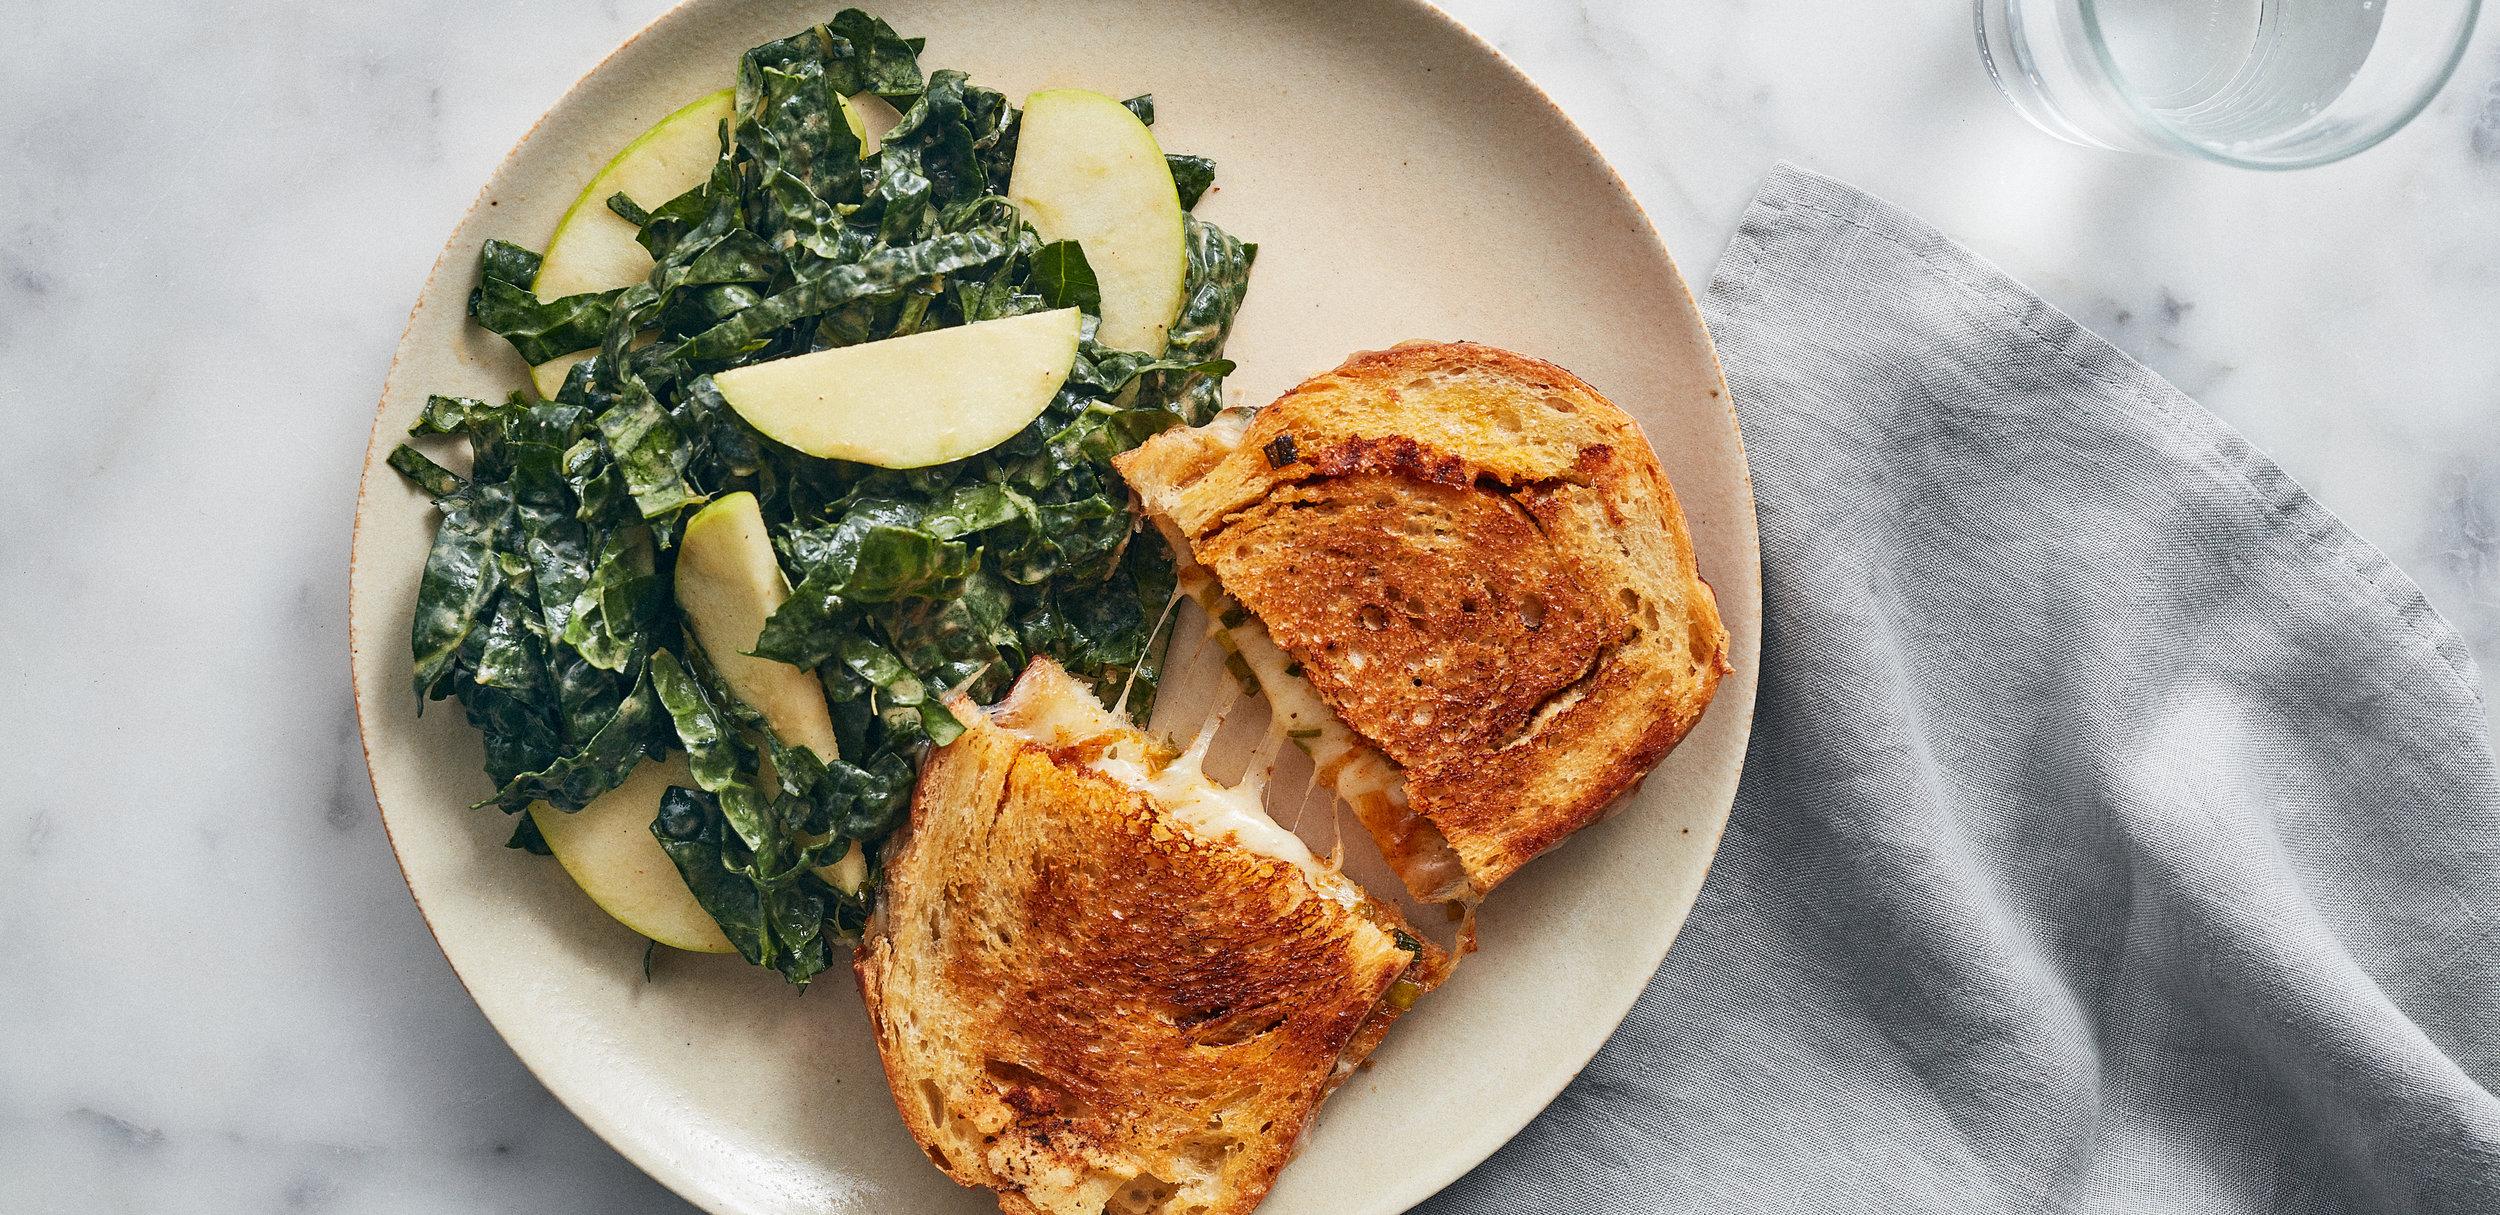 Gochujang Grilled Cheese with Peanut-Kale Salad — 0007 — HERO (1).jpg